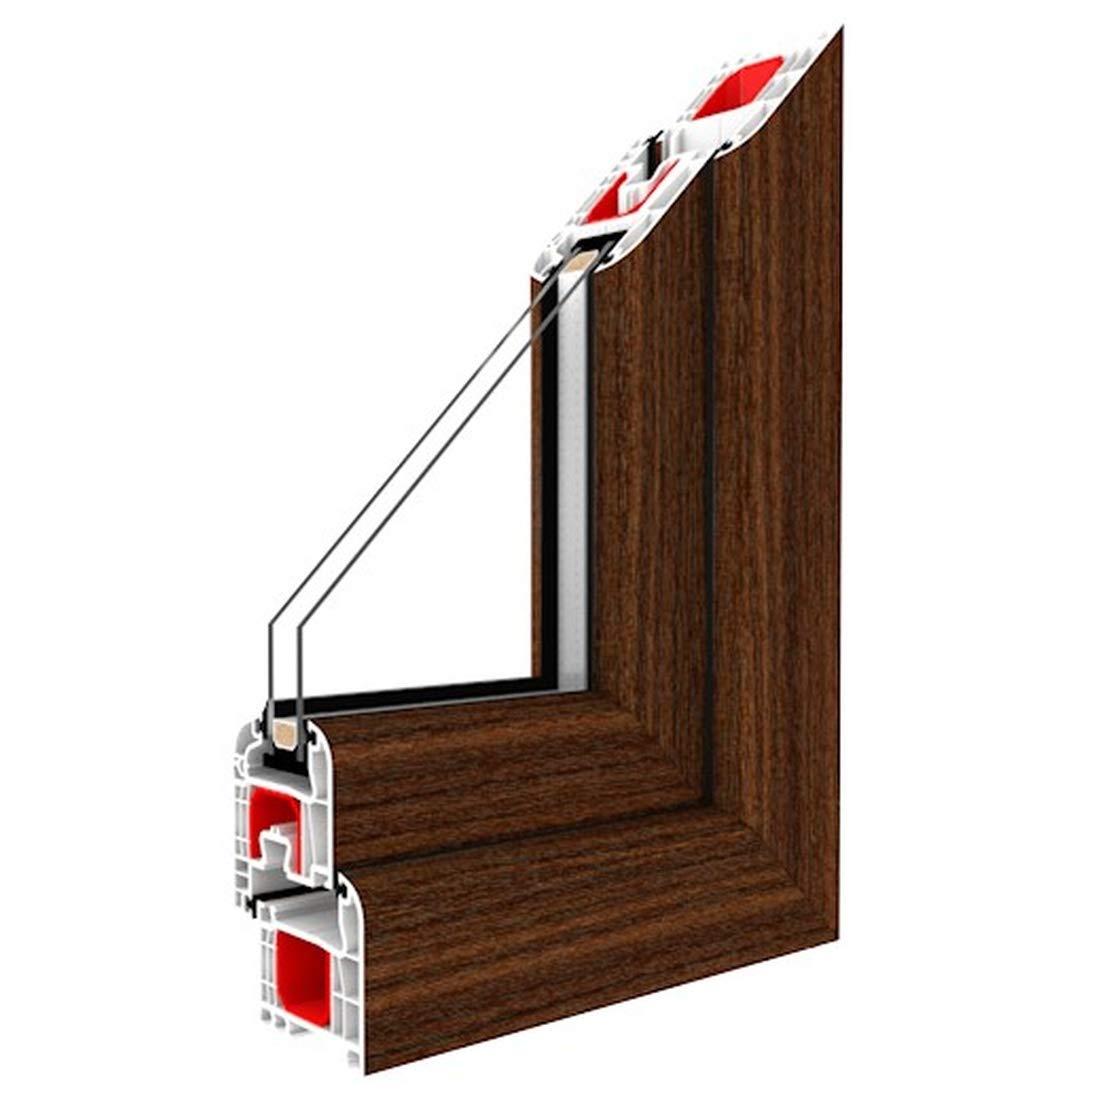 Fest im Rahmen Glas:2-Fach Festverglasung Fenster Mahagoni beidseitig 1 flg BxH:500x500